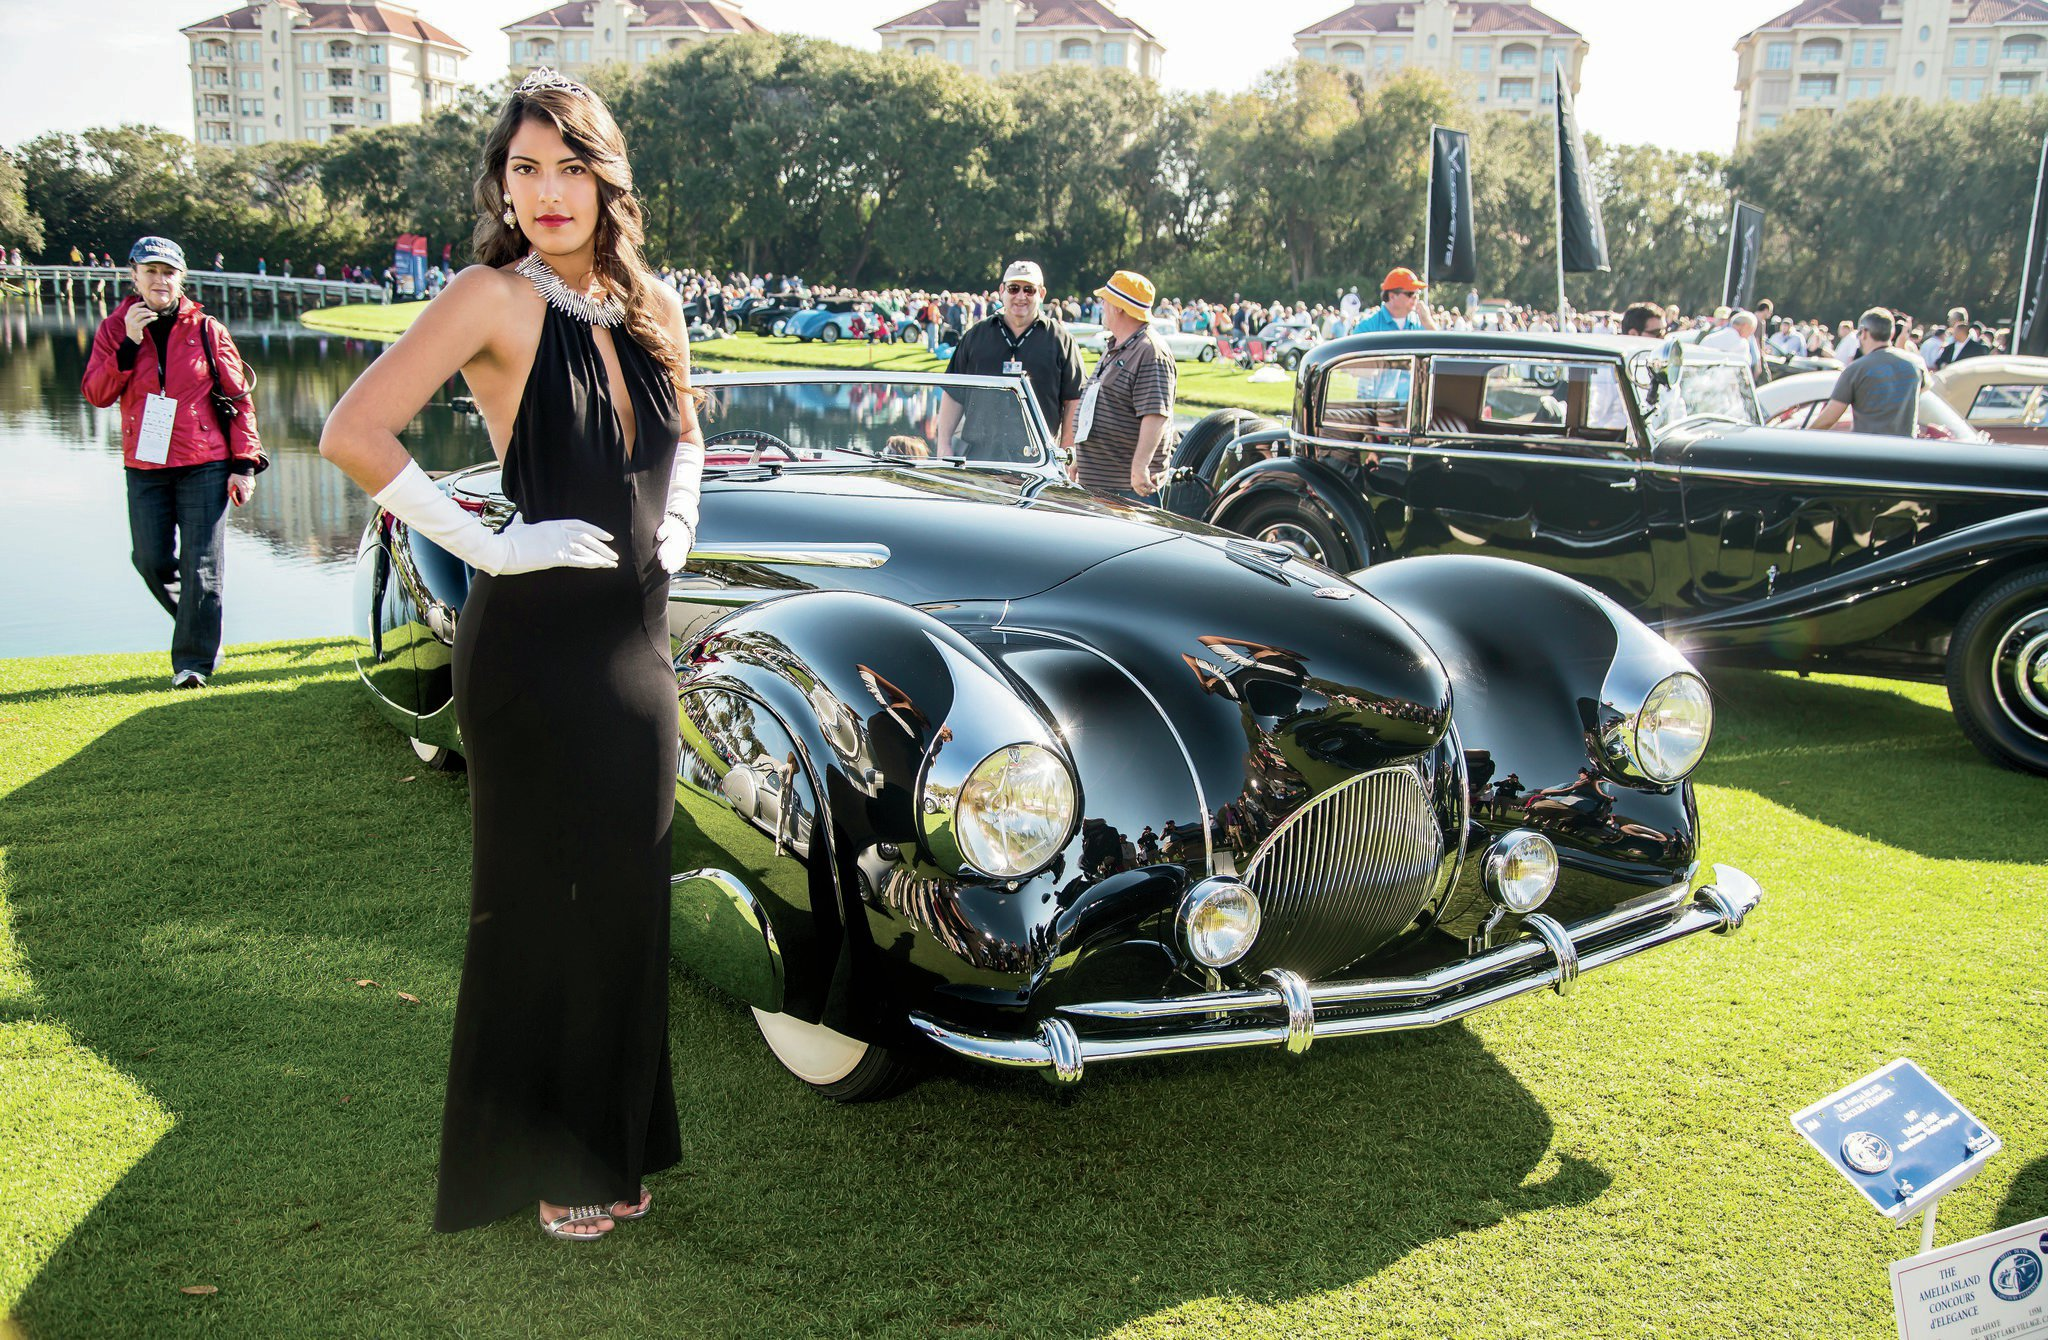 Batmobiles BMWs Ultimate Racing Machines - Amelia island car show